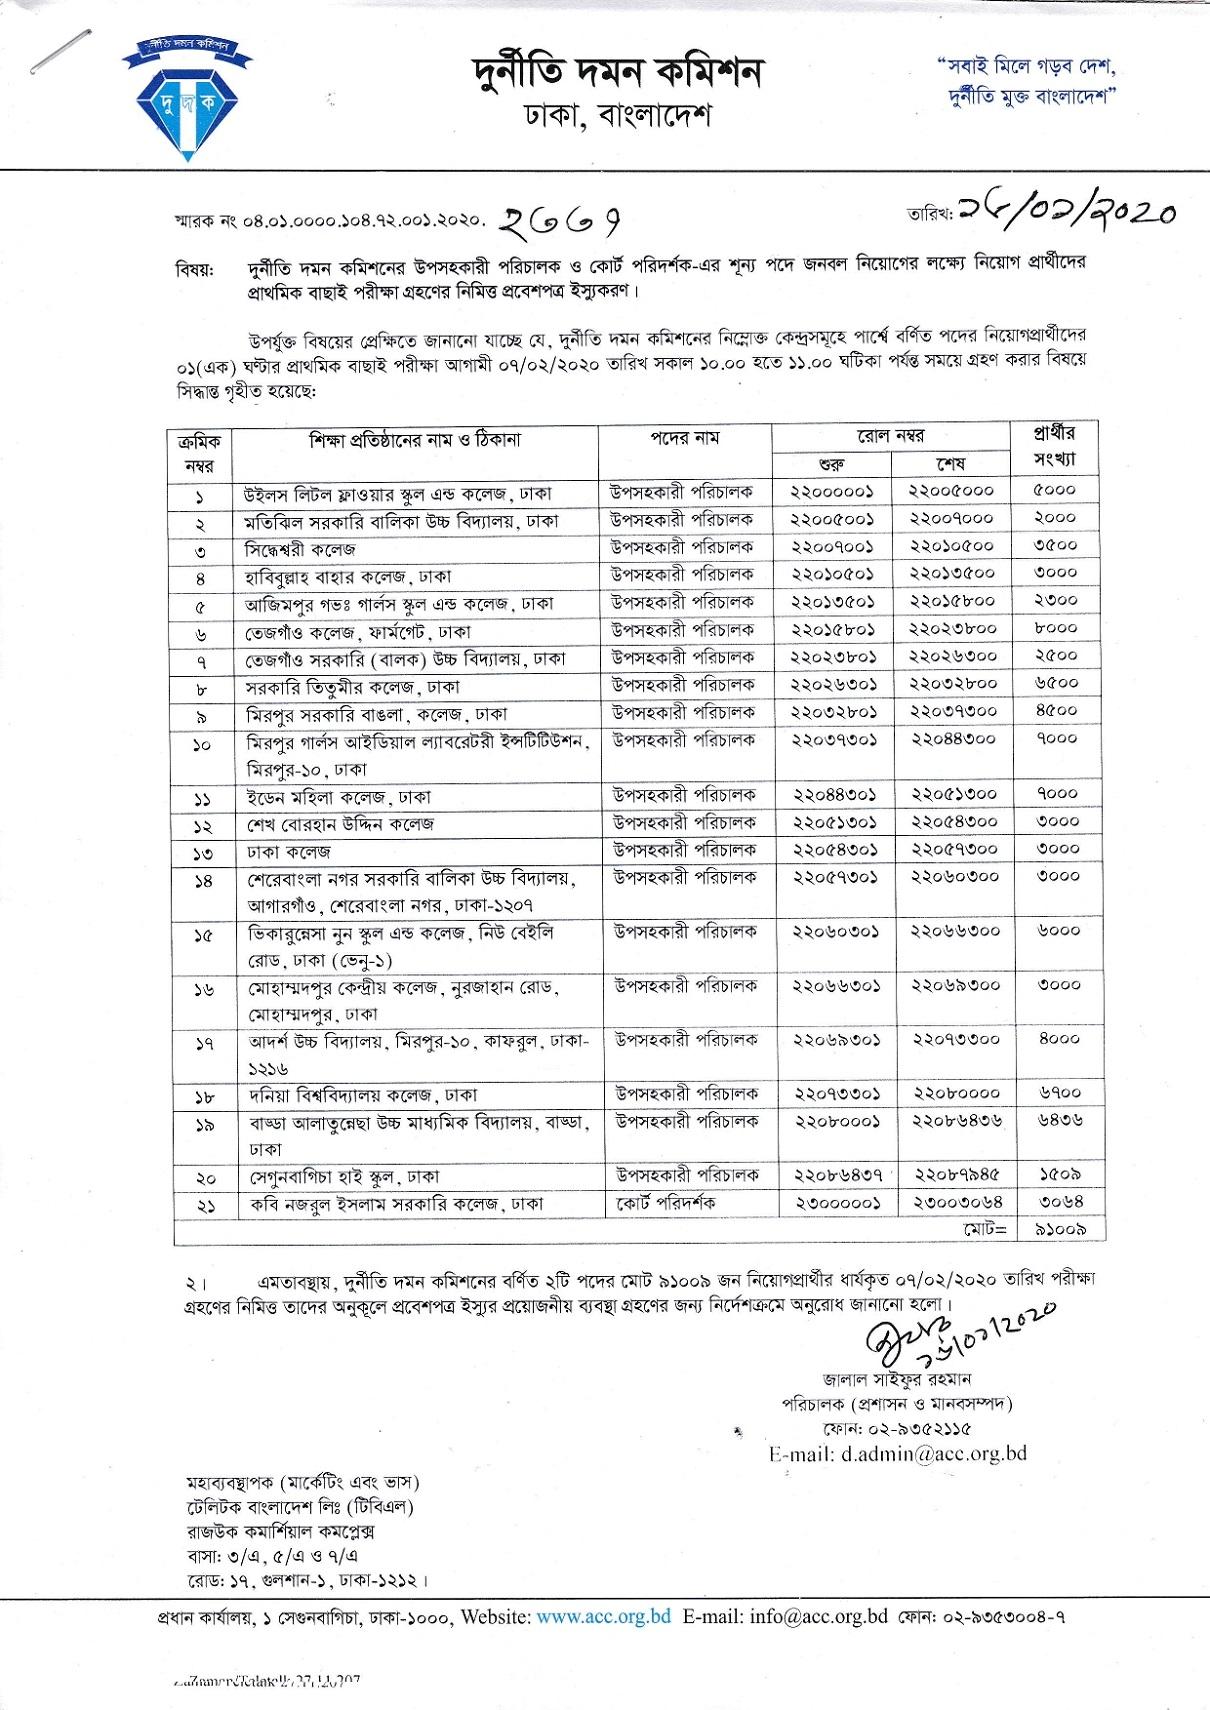 Anti Corruption Commission Exam Date 2020